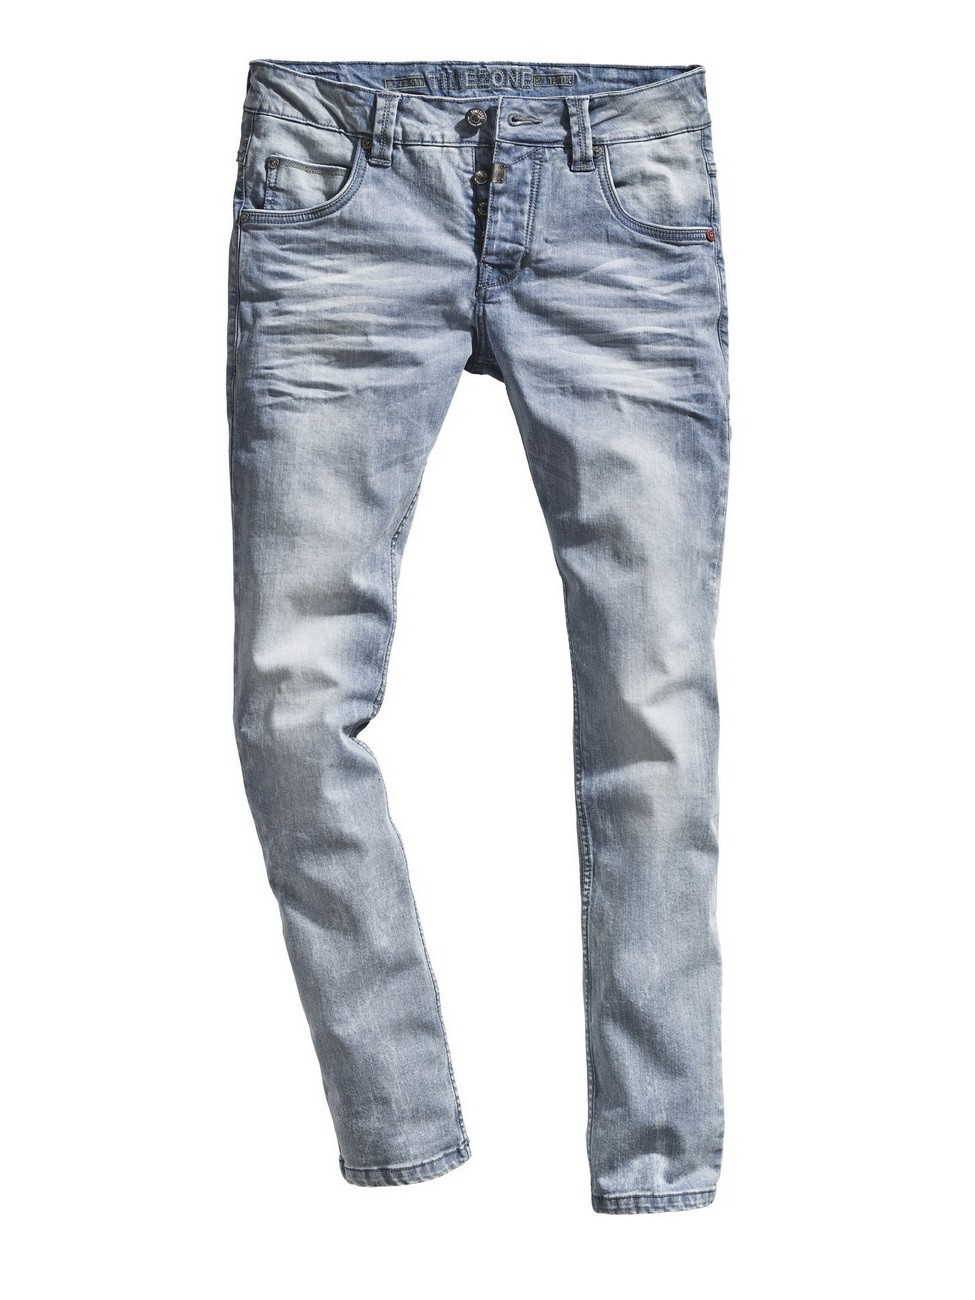 timezone herren jeans edotz slim fit blau vintage blue. Black Bedroom Furniture Sets. Home Design Ideas